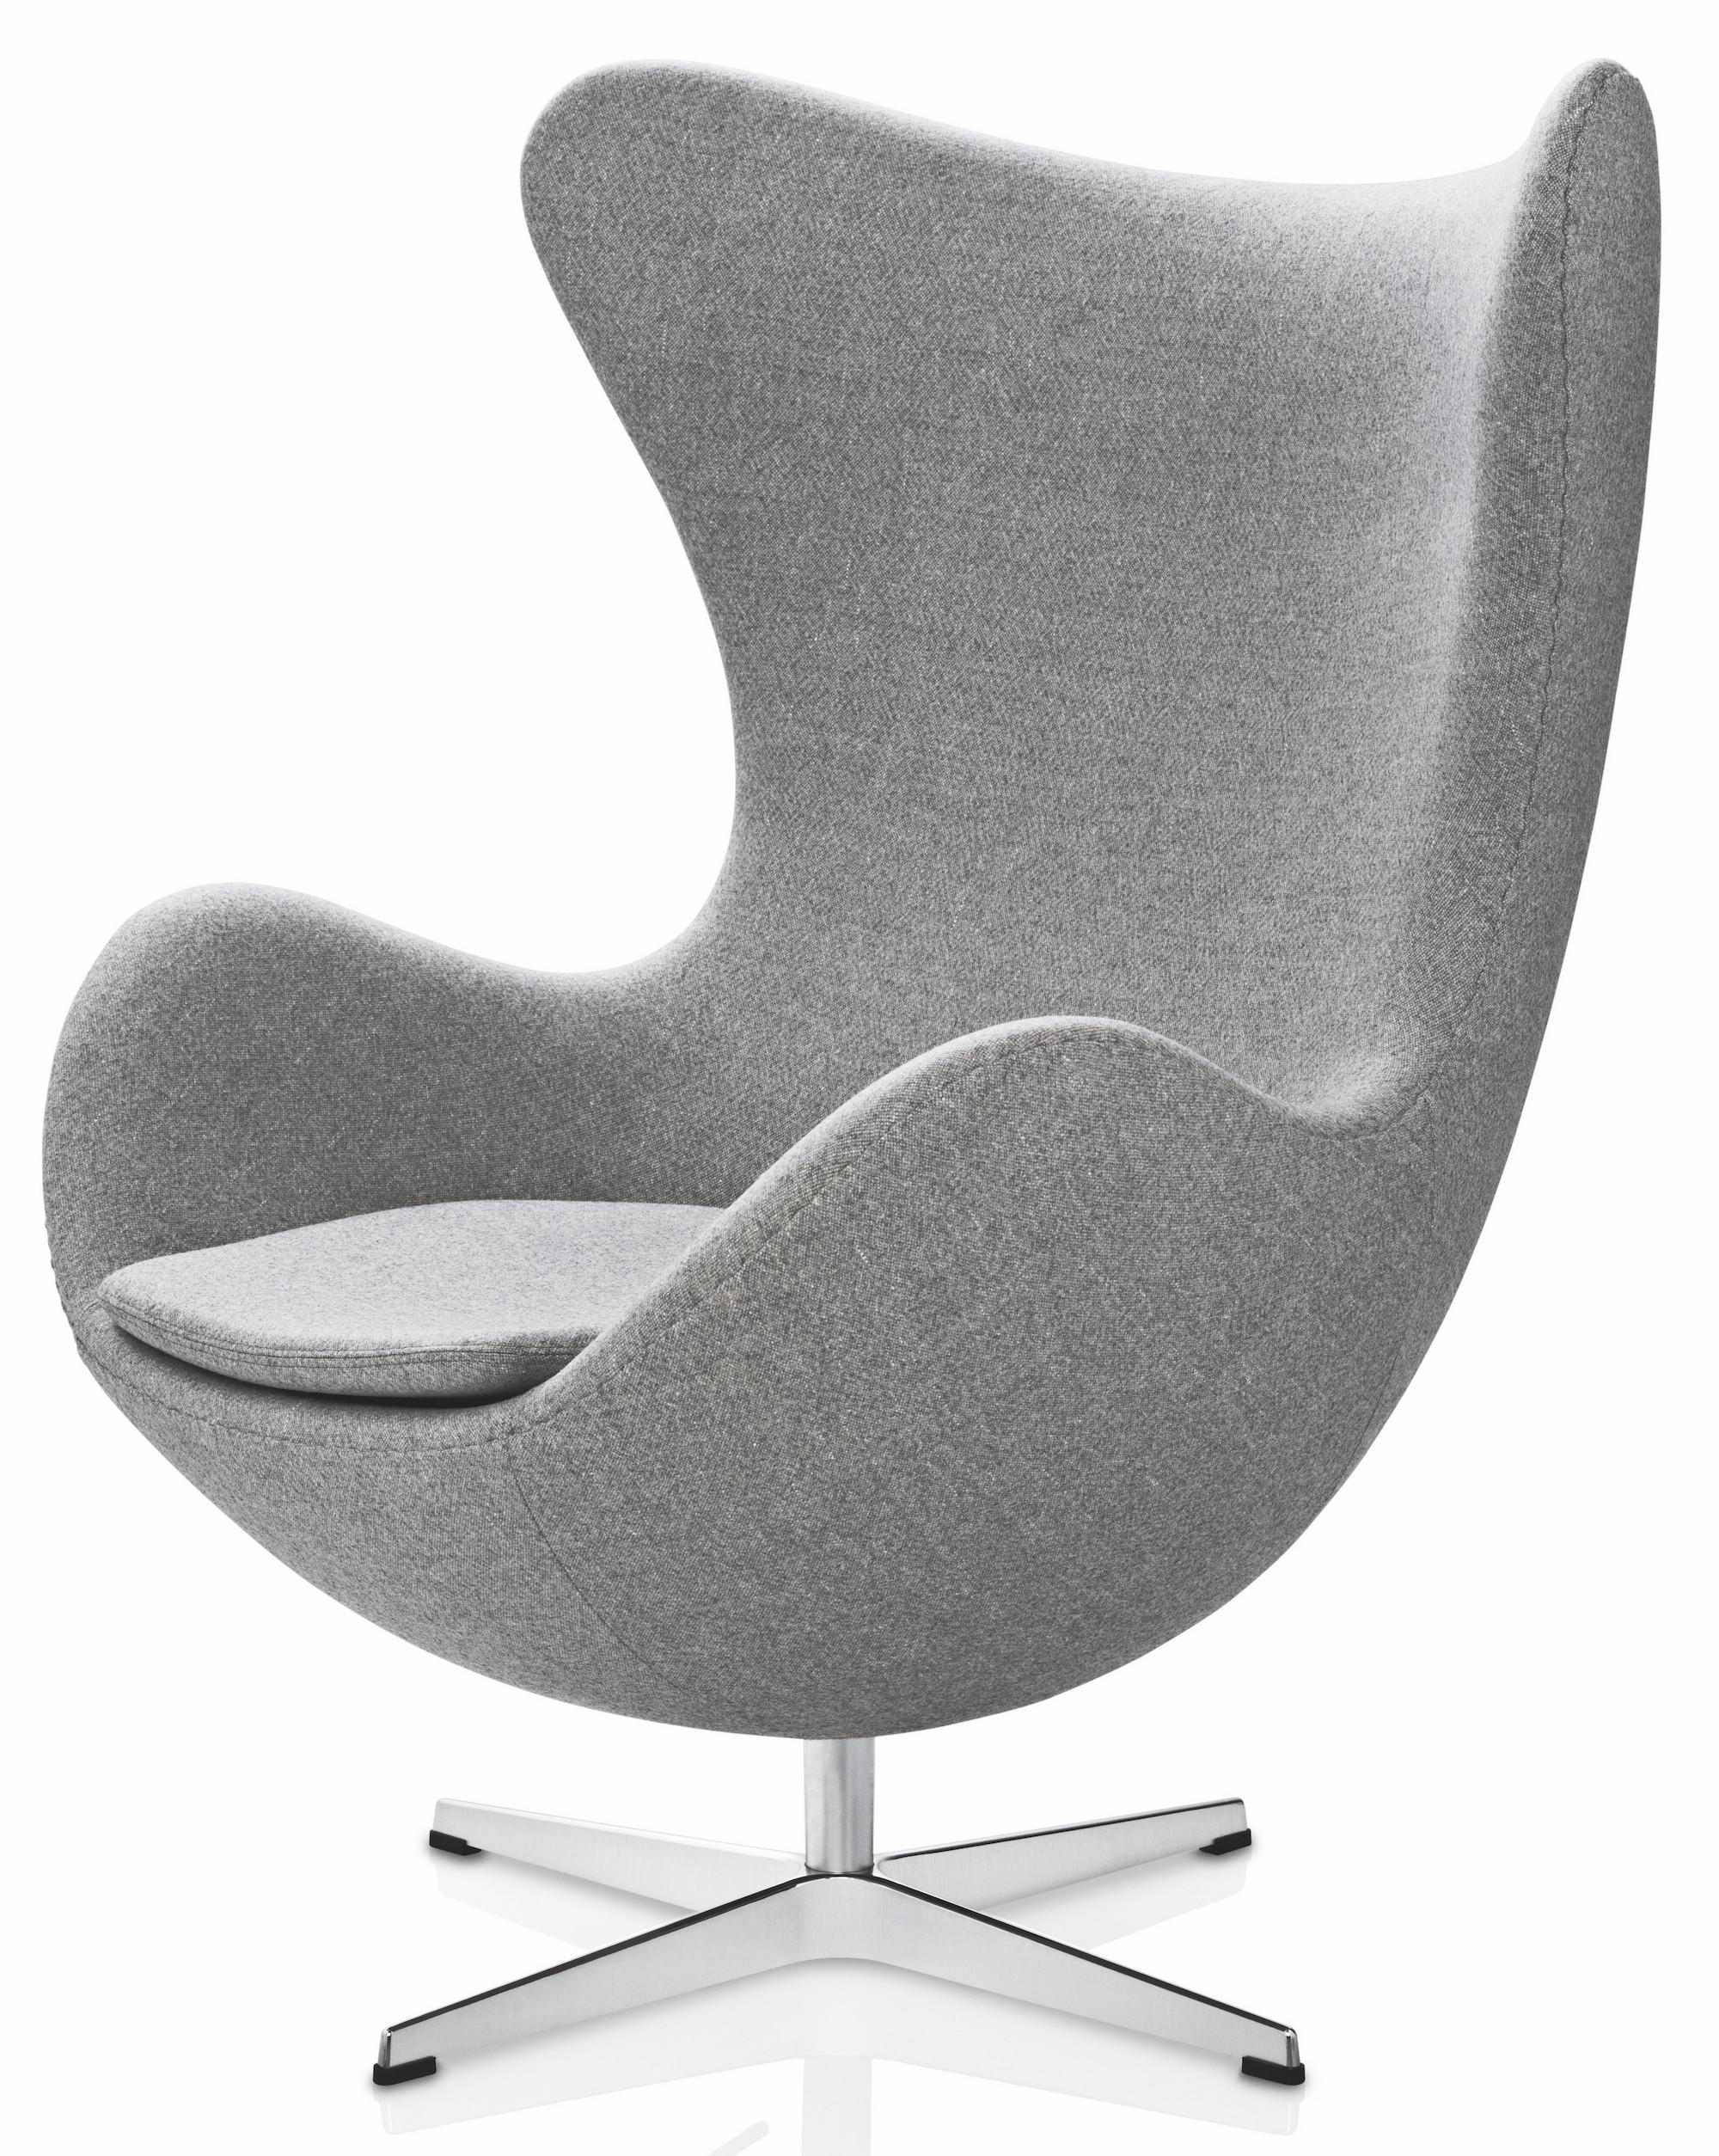 fritz hansen fauteuil egg arne jacobsen. Black Bedroom Furniture Sets. Home Design Ideas